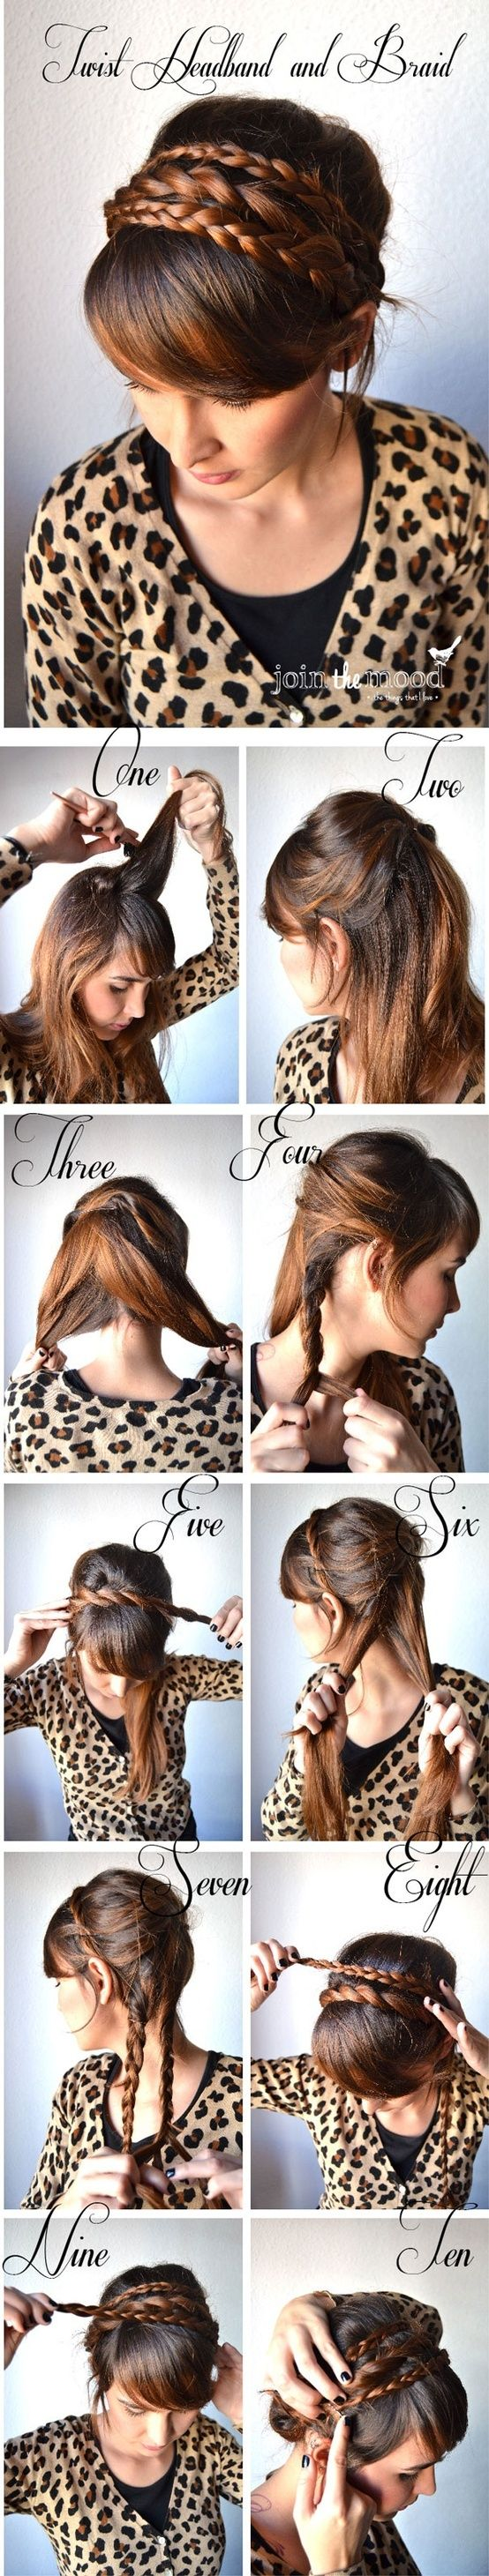 10 Step Braided Headband -